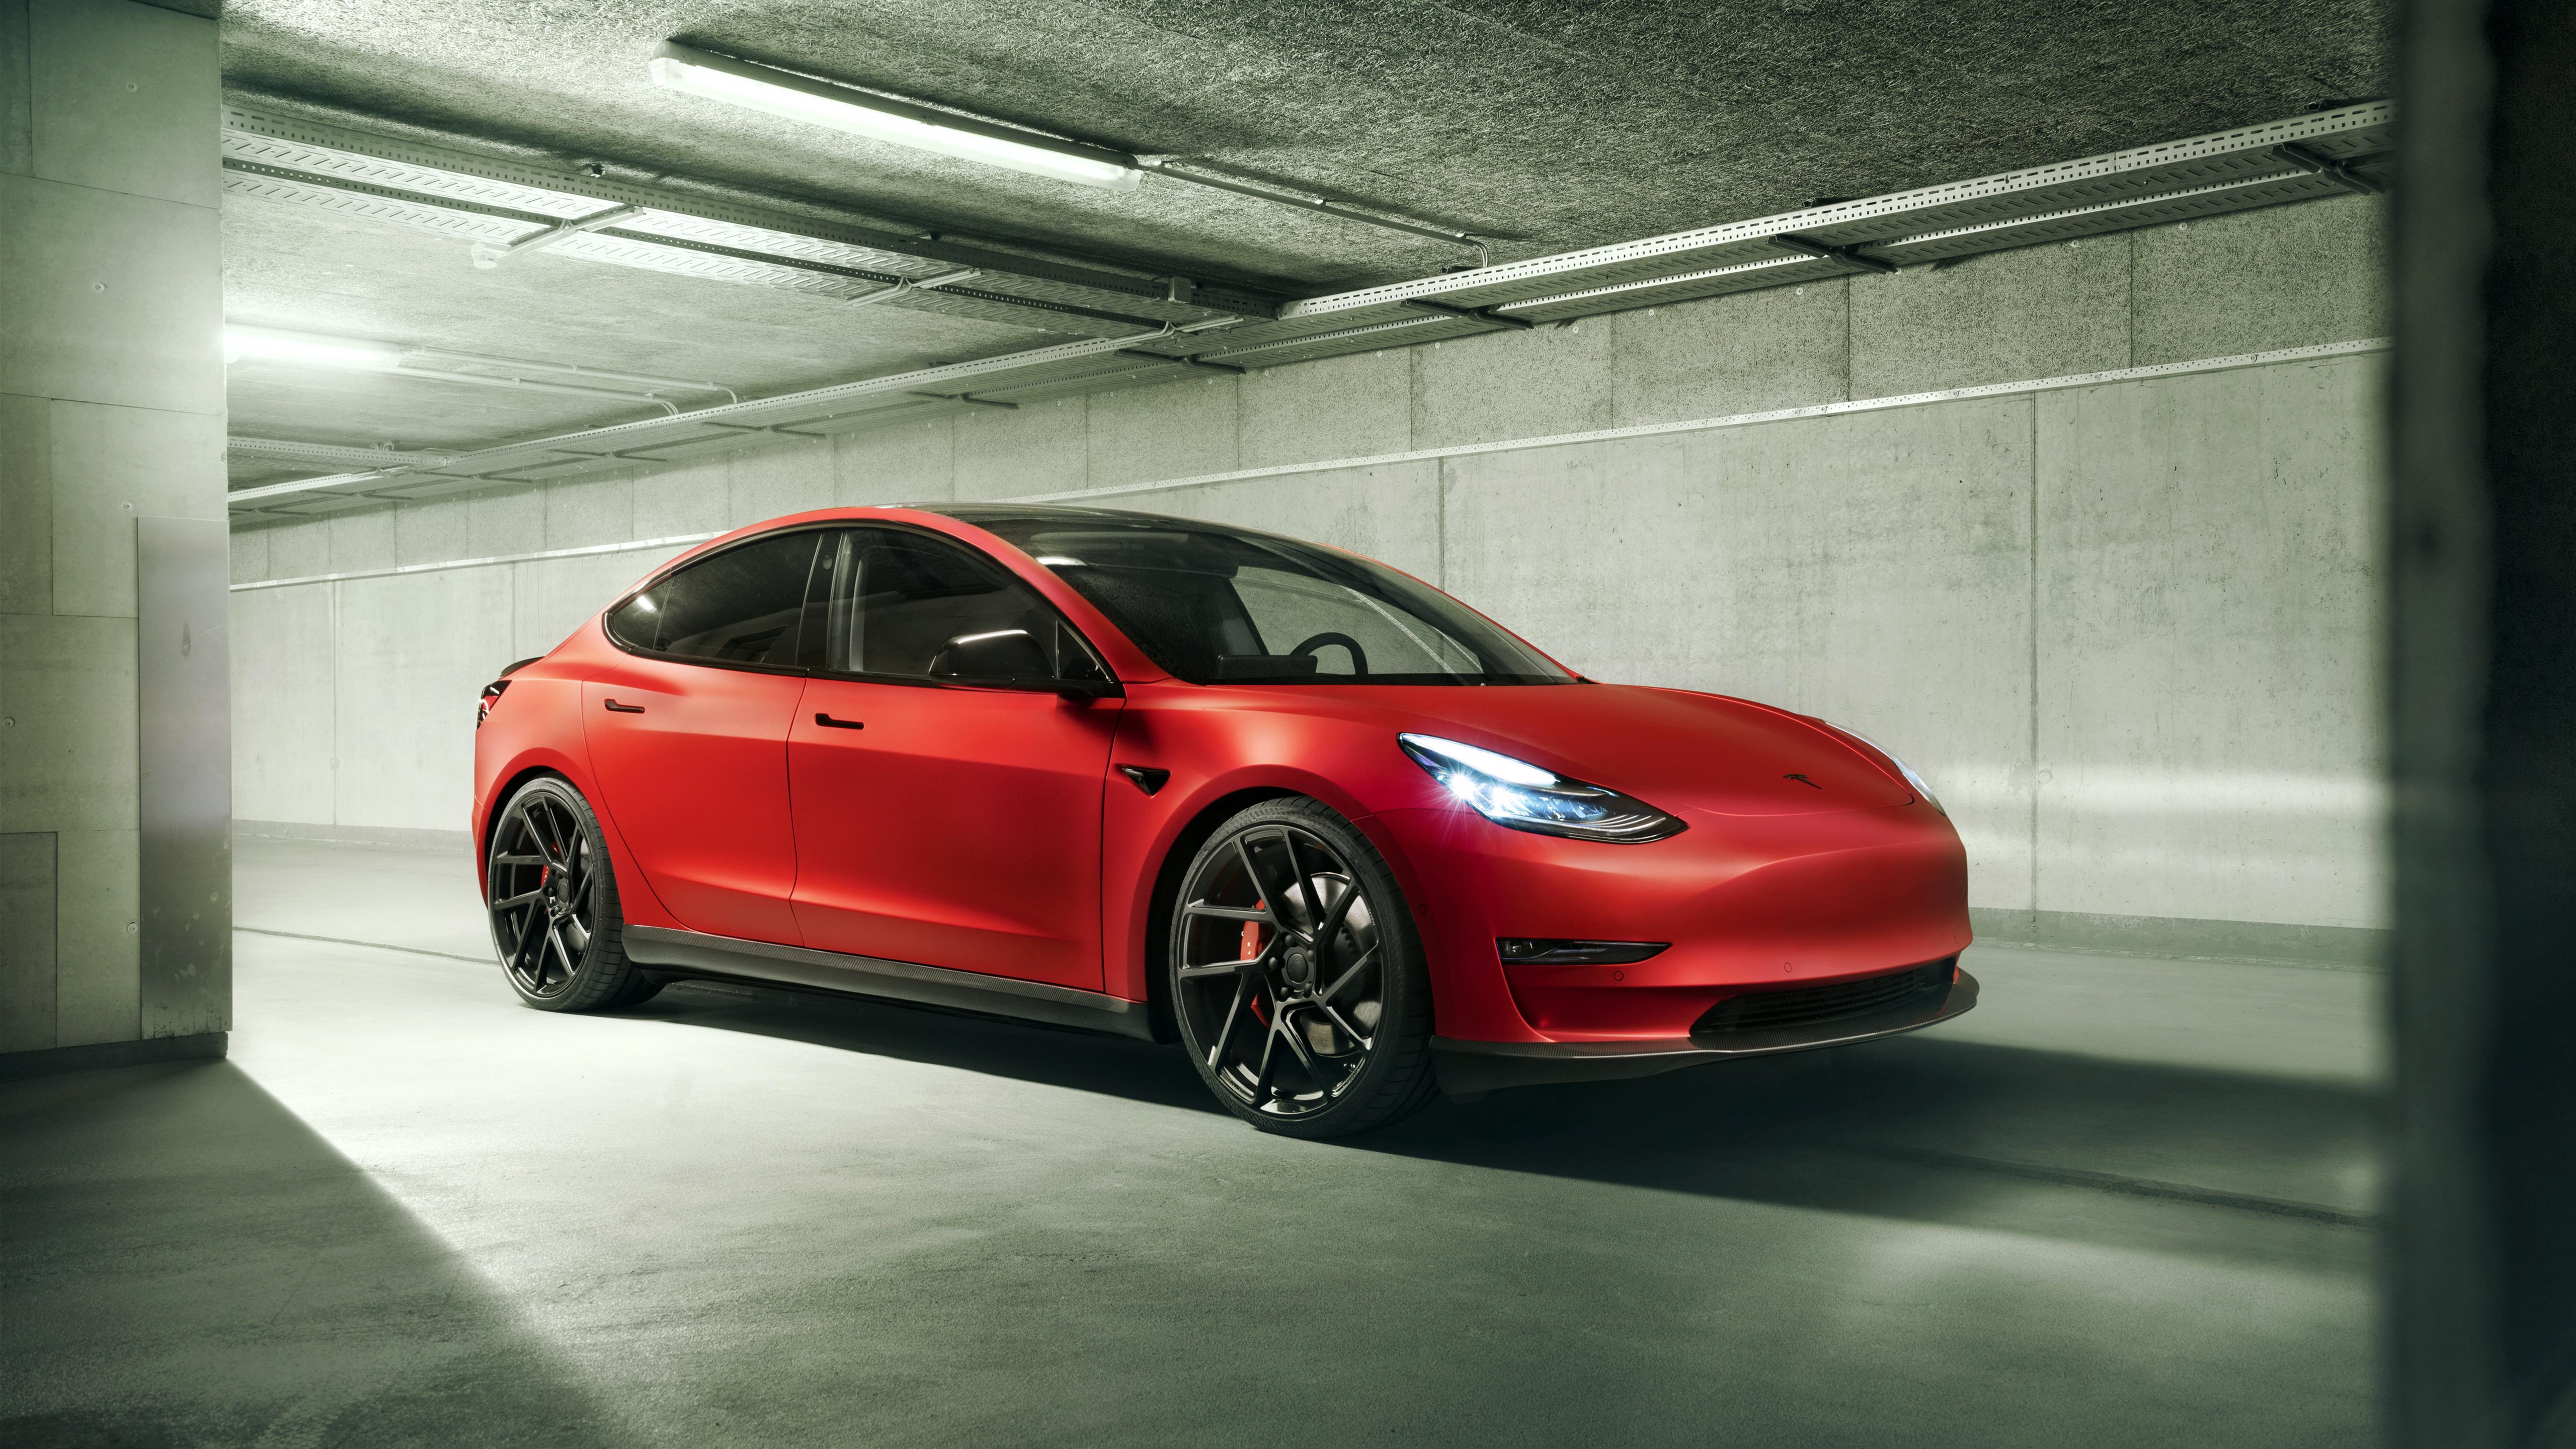 Novitec Tesla Model 3 2019 4k Hd Wallpaper 5120x2880 1356825 Wallpaperup Novitec tesla model 3 2019 4k 2